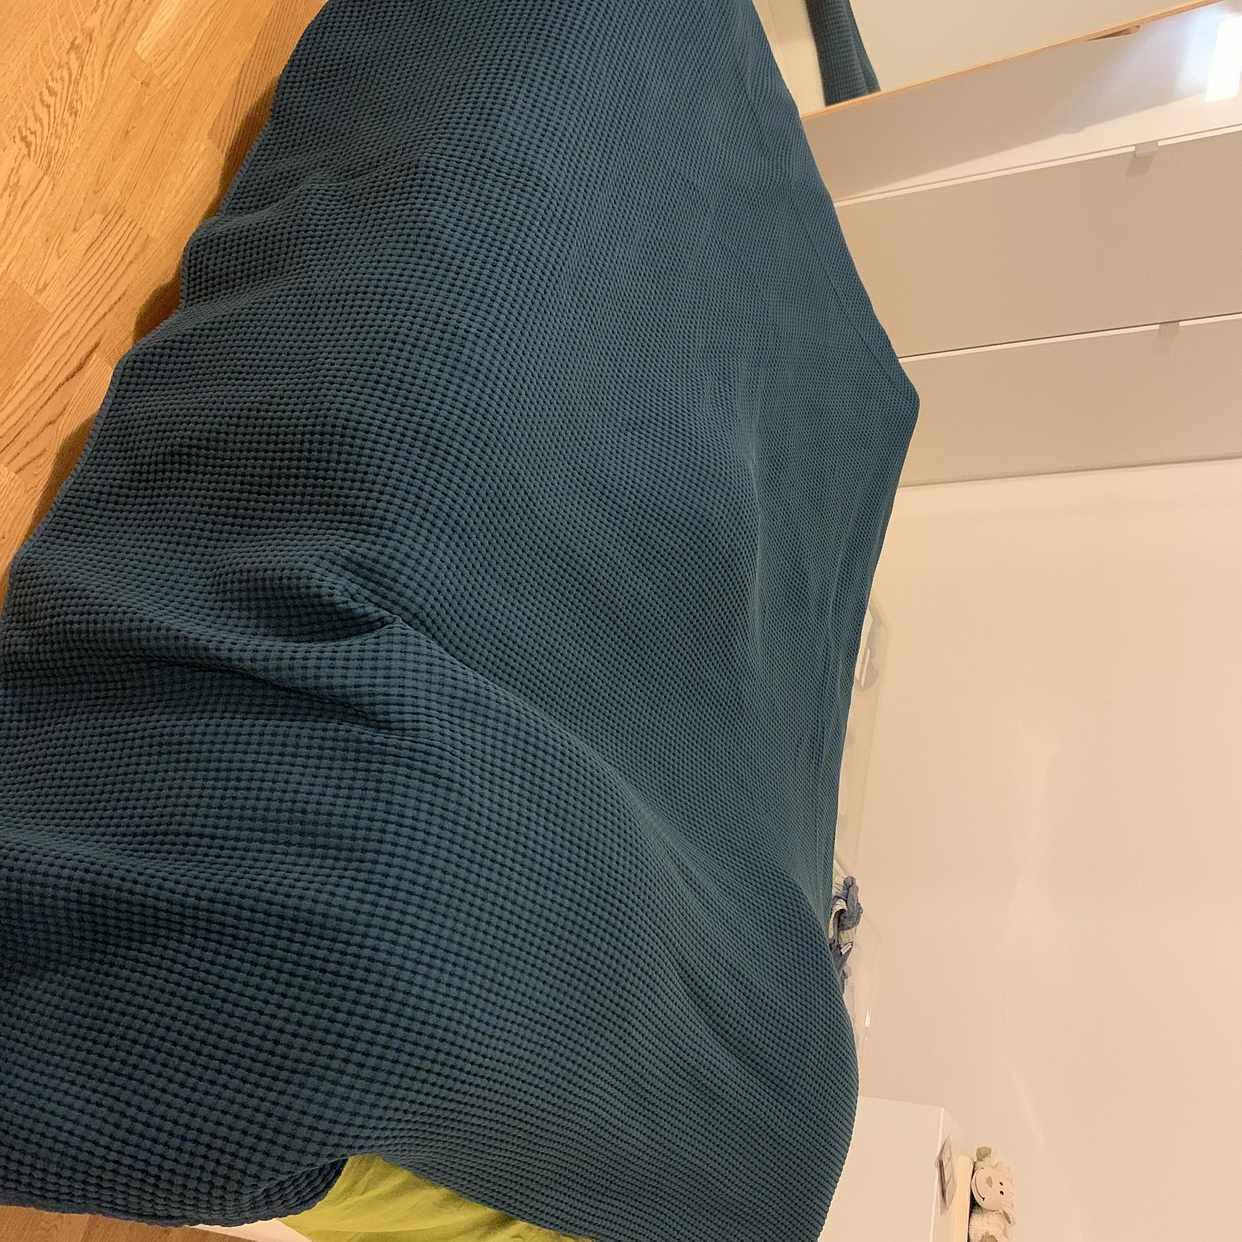 image of Bed mattress - Sundbyberg